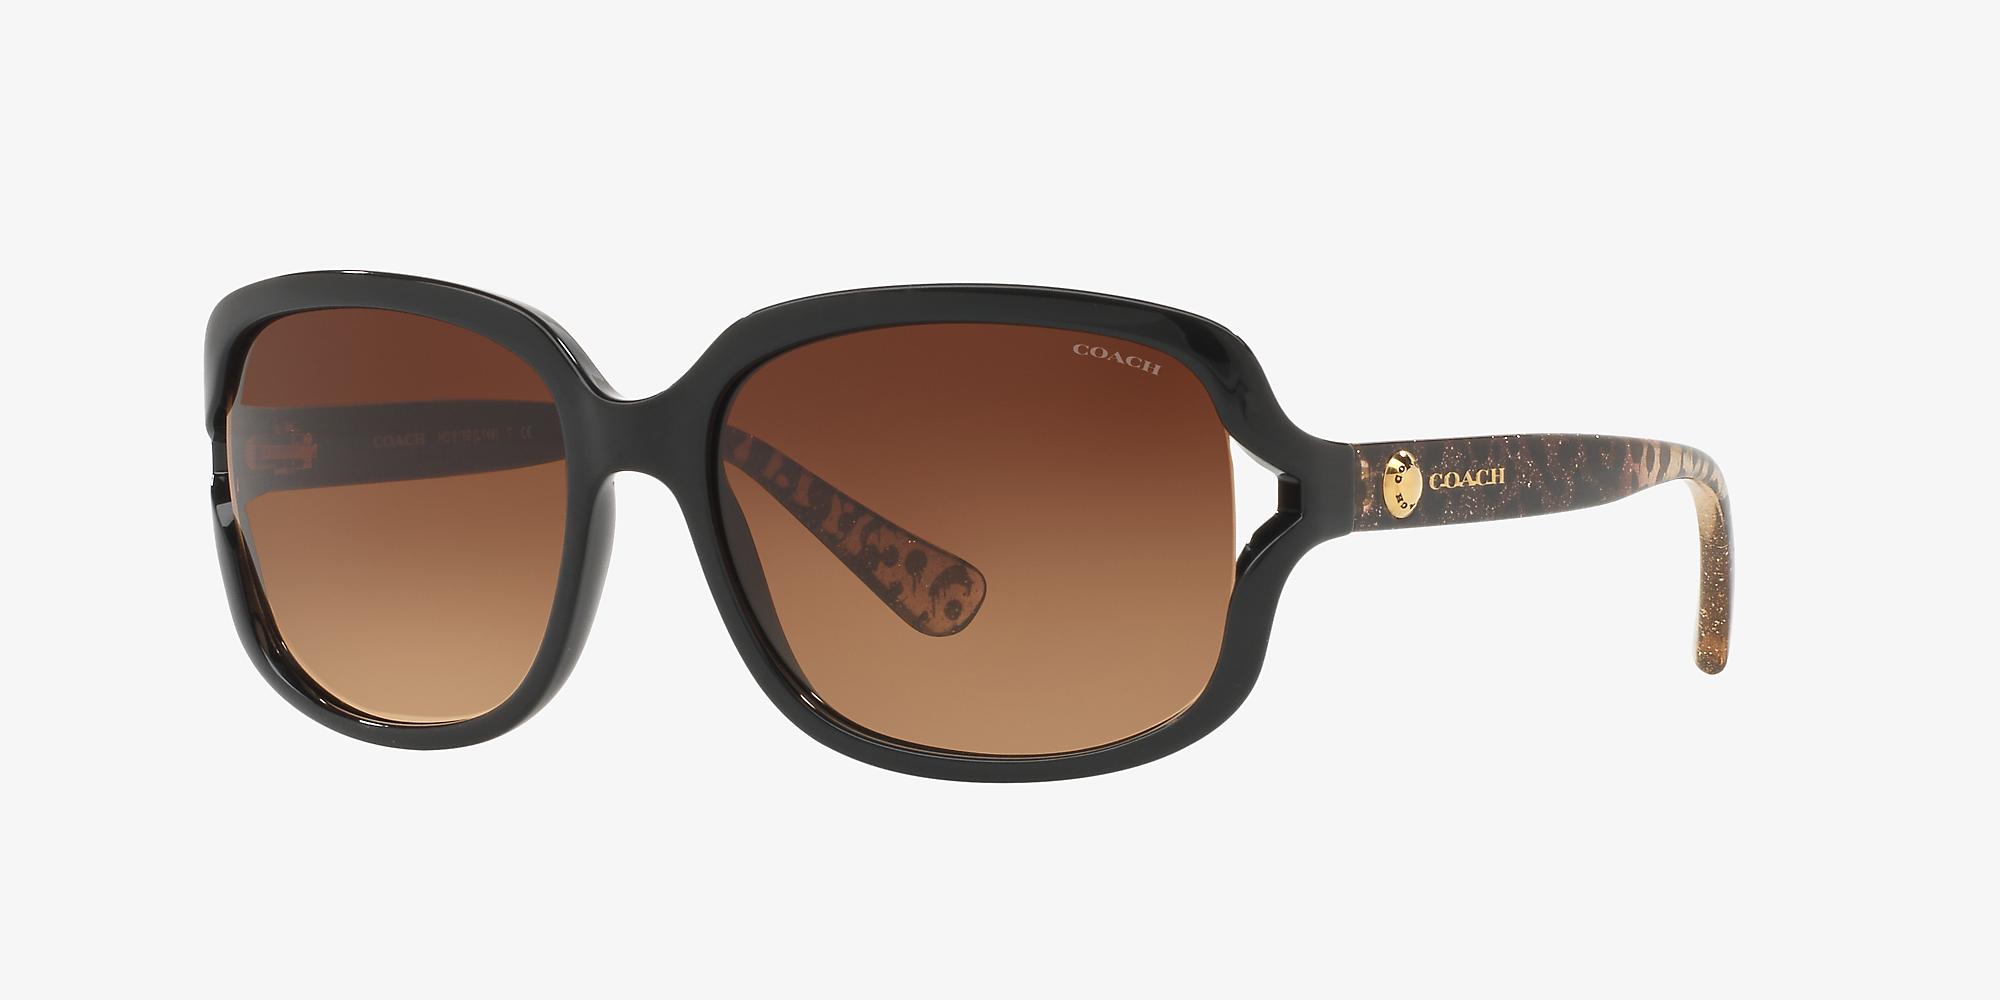 2f23e114a256 Coach HC8169 57 Brown & Black Sunglasses | Sunglass Hut USA